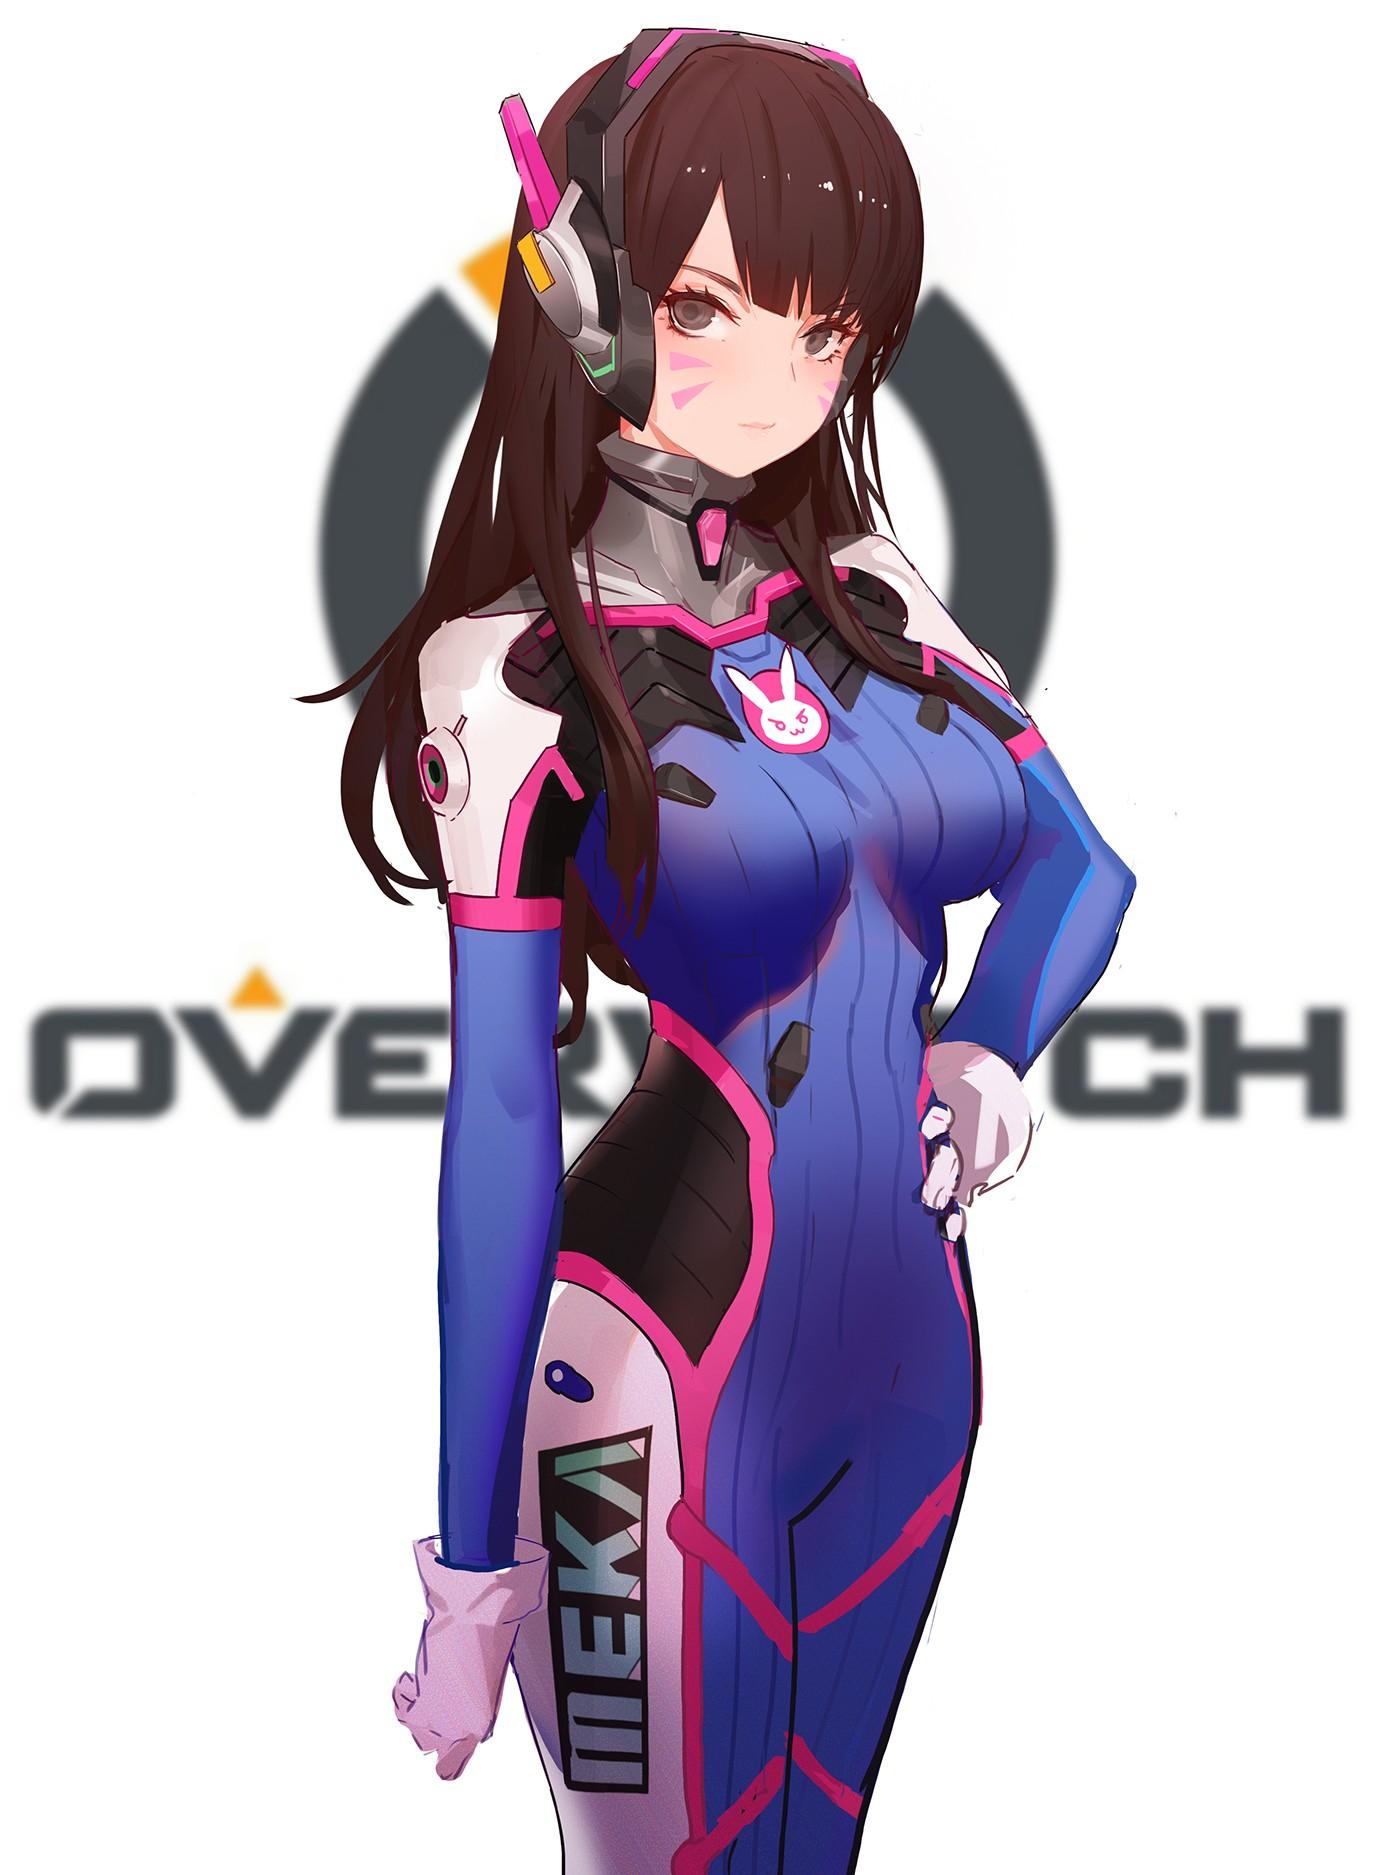 Anime 1400x1875 anime anime girls Overwatch D.Va (Overwatch) bodysuit headphones long hair